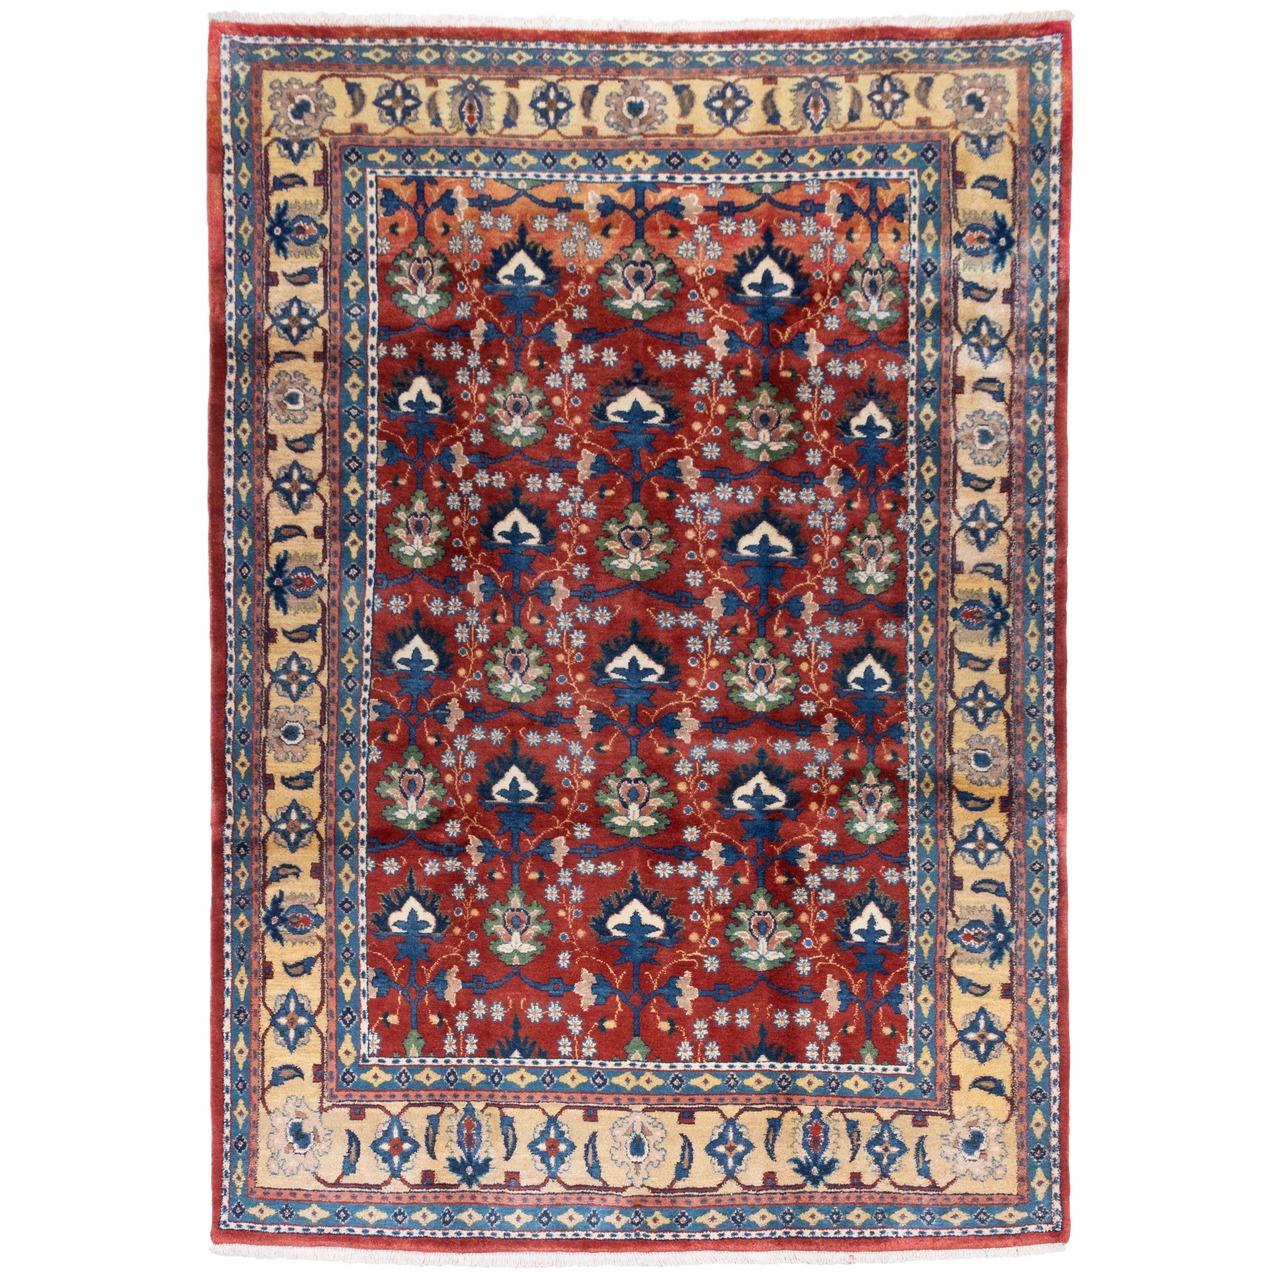 فرش دستباف شش متری سی پرشیا کد 171176